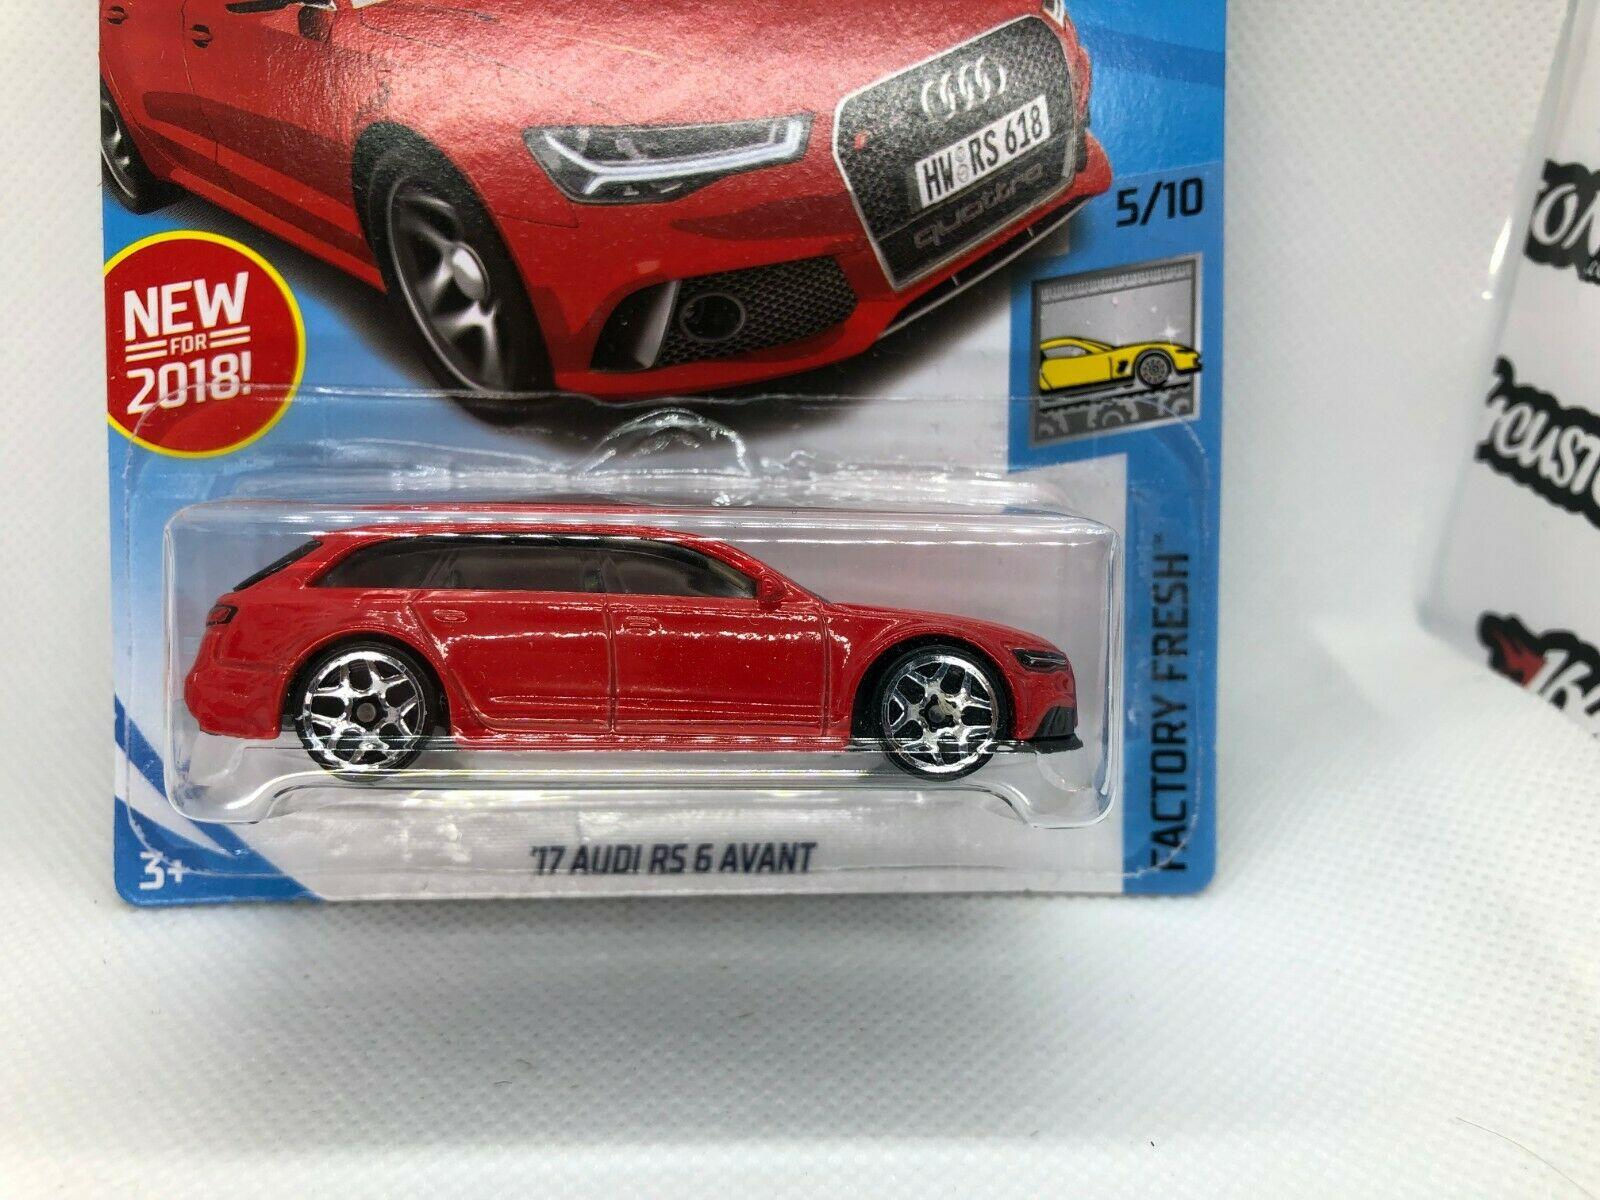 17 Audi RS 6 Avant